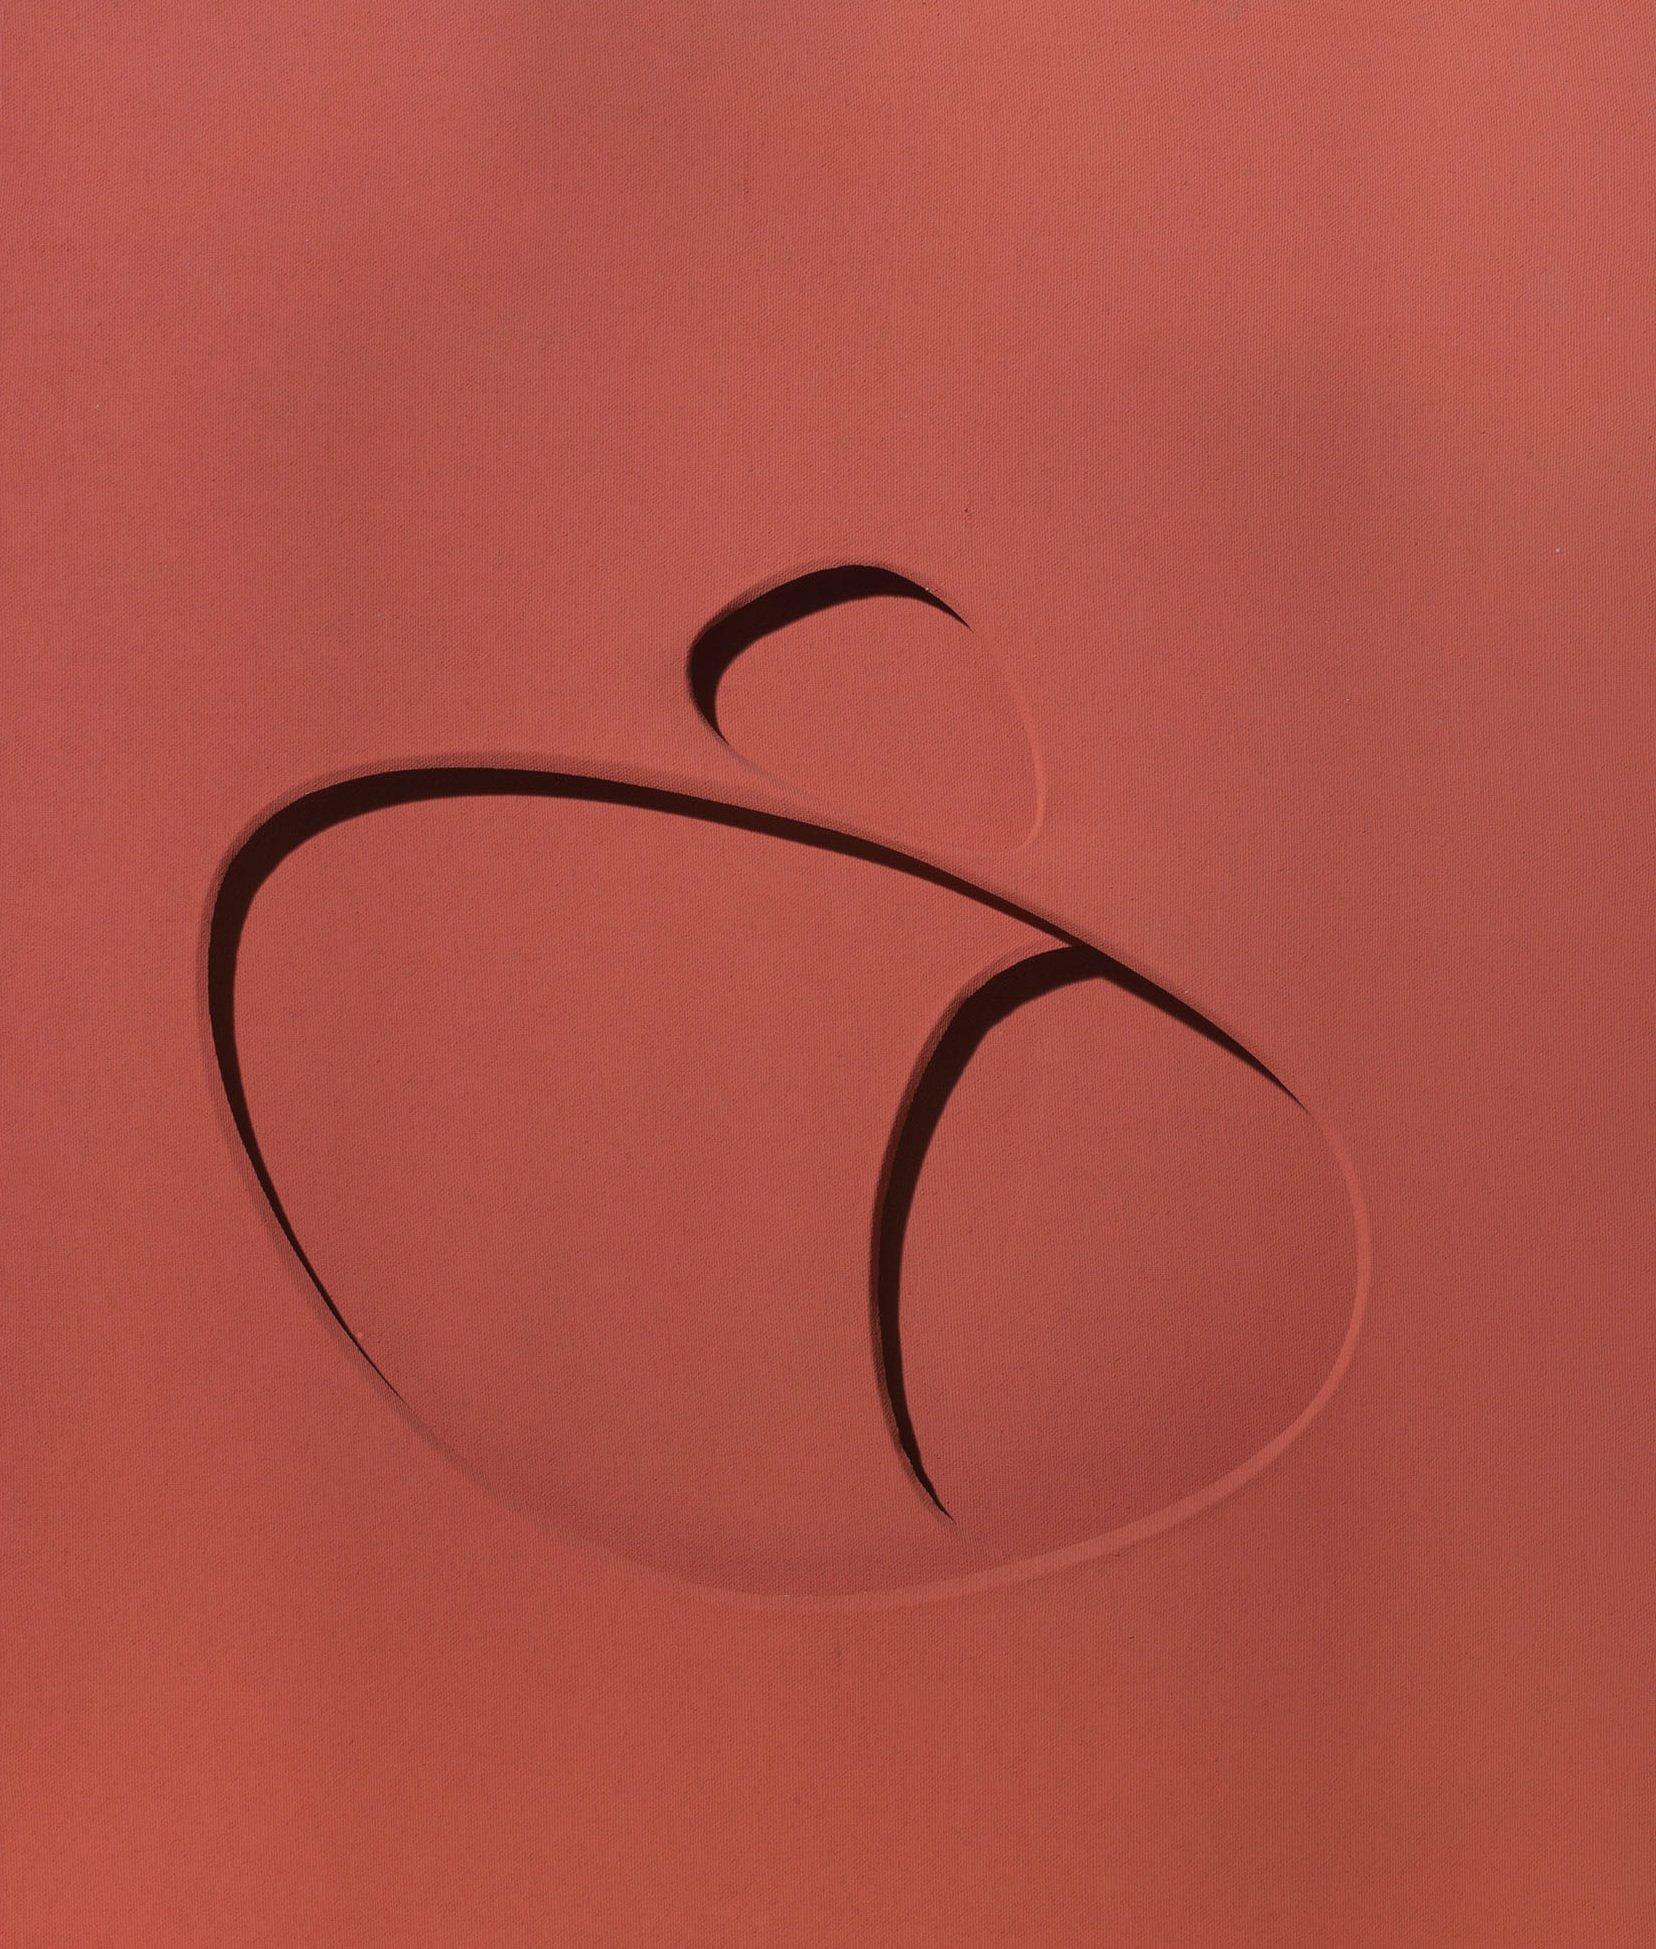 Scheggi, Zone riflesse, 1963, 70x60x5 cm